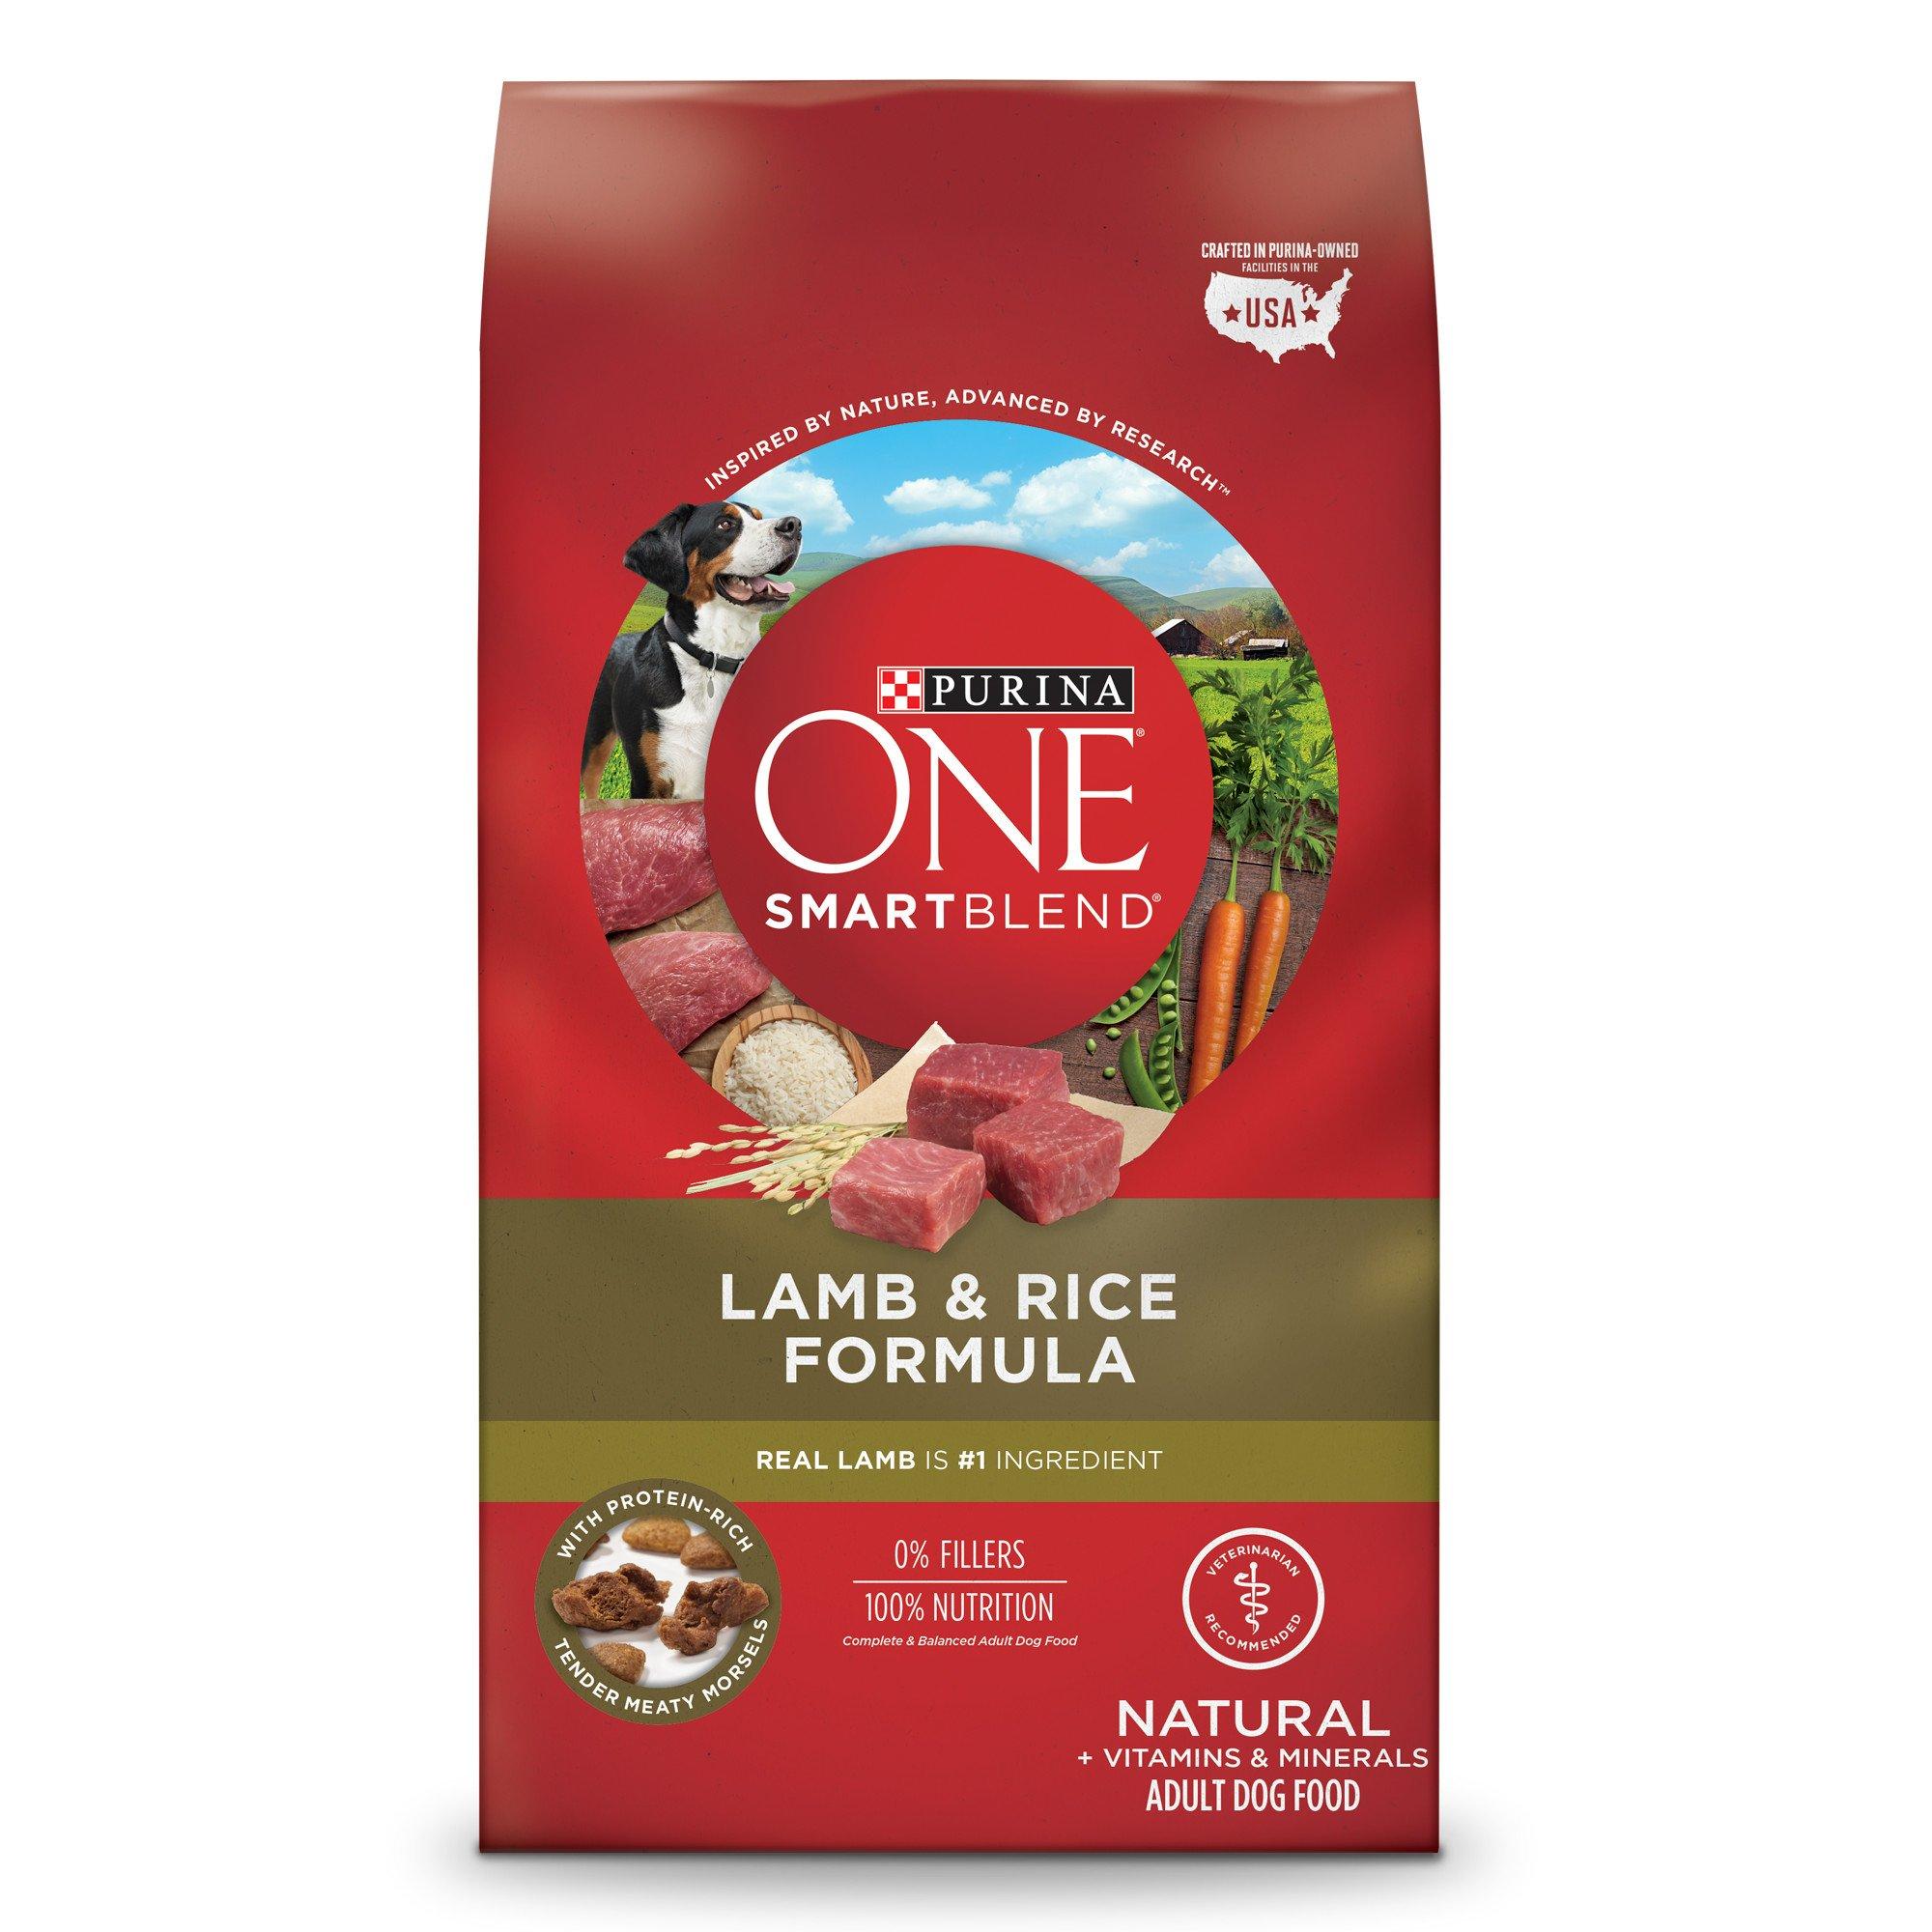 Purina ONE Smartblend Lamb & Rice Formula Dog Food | Petco